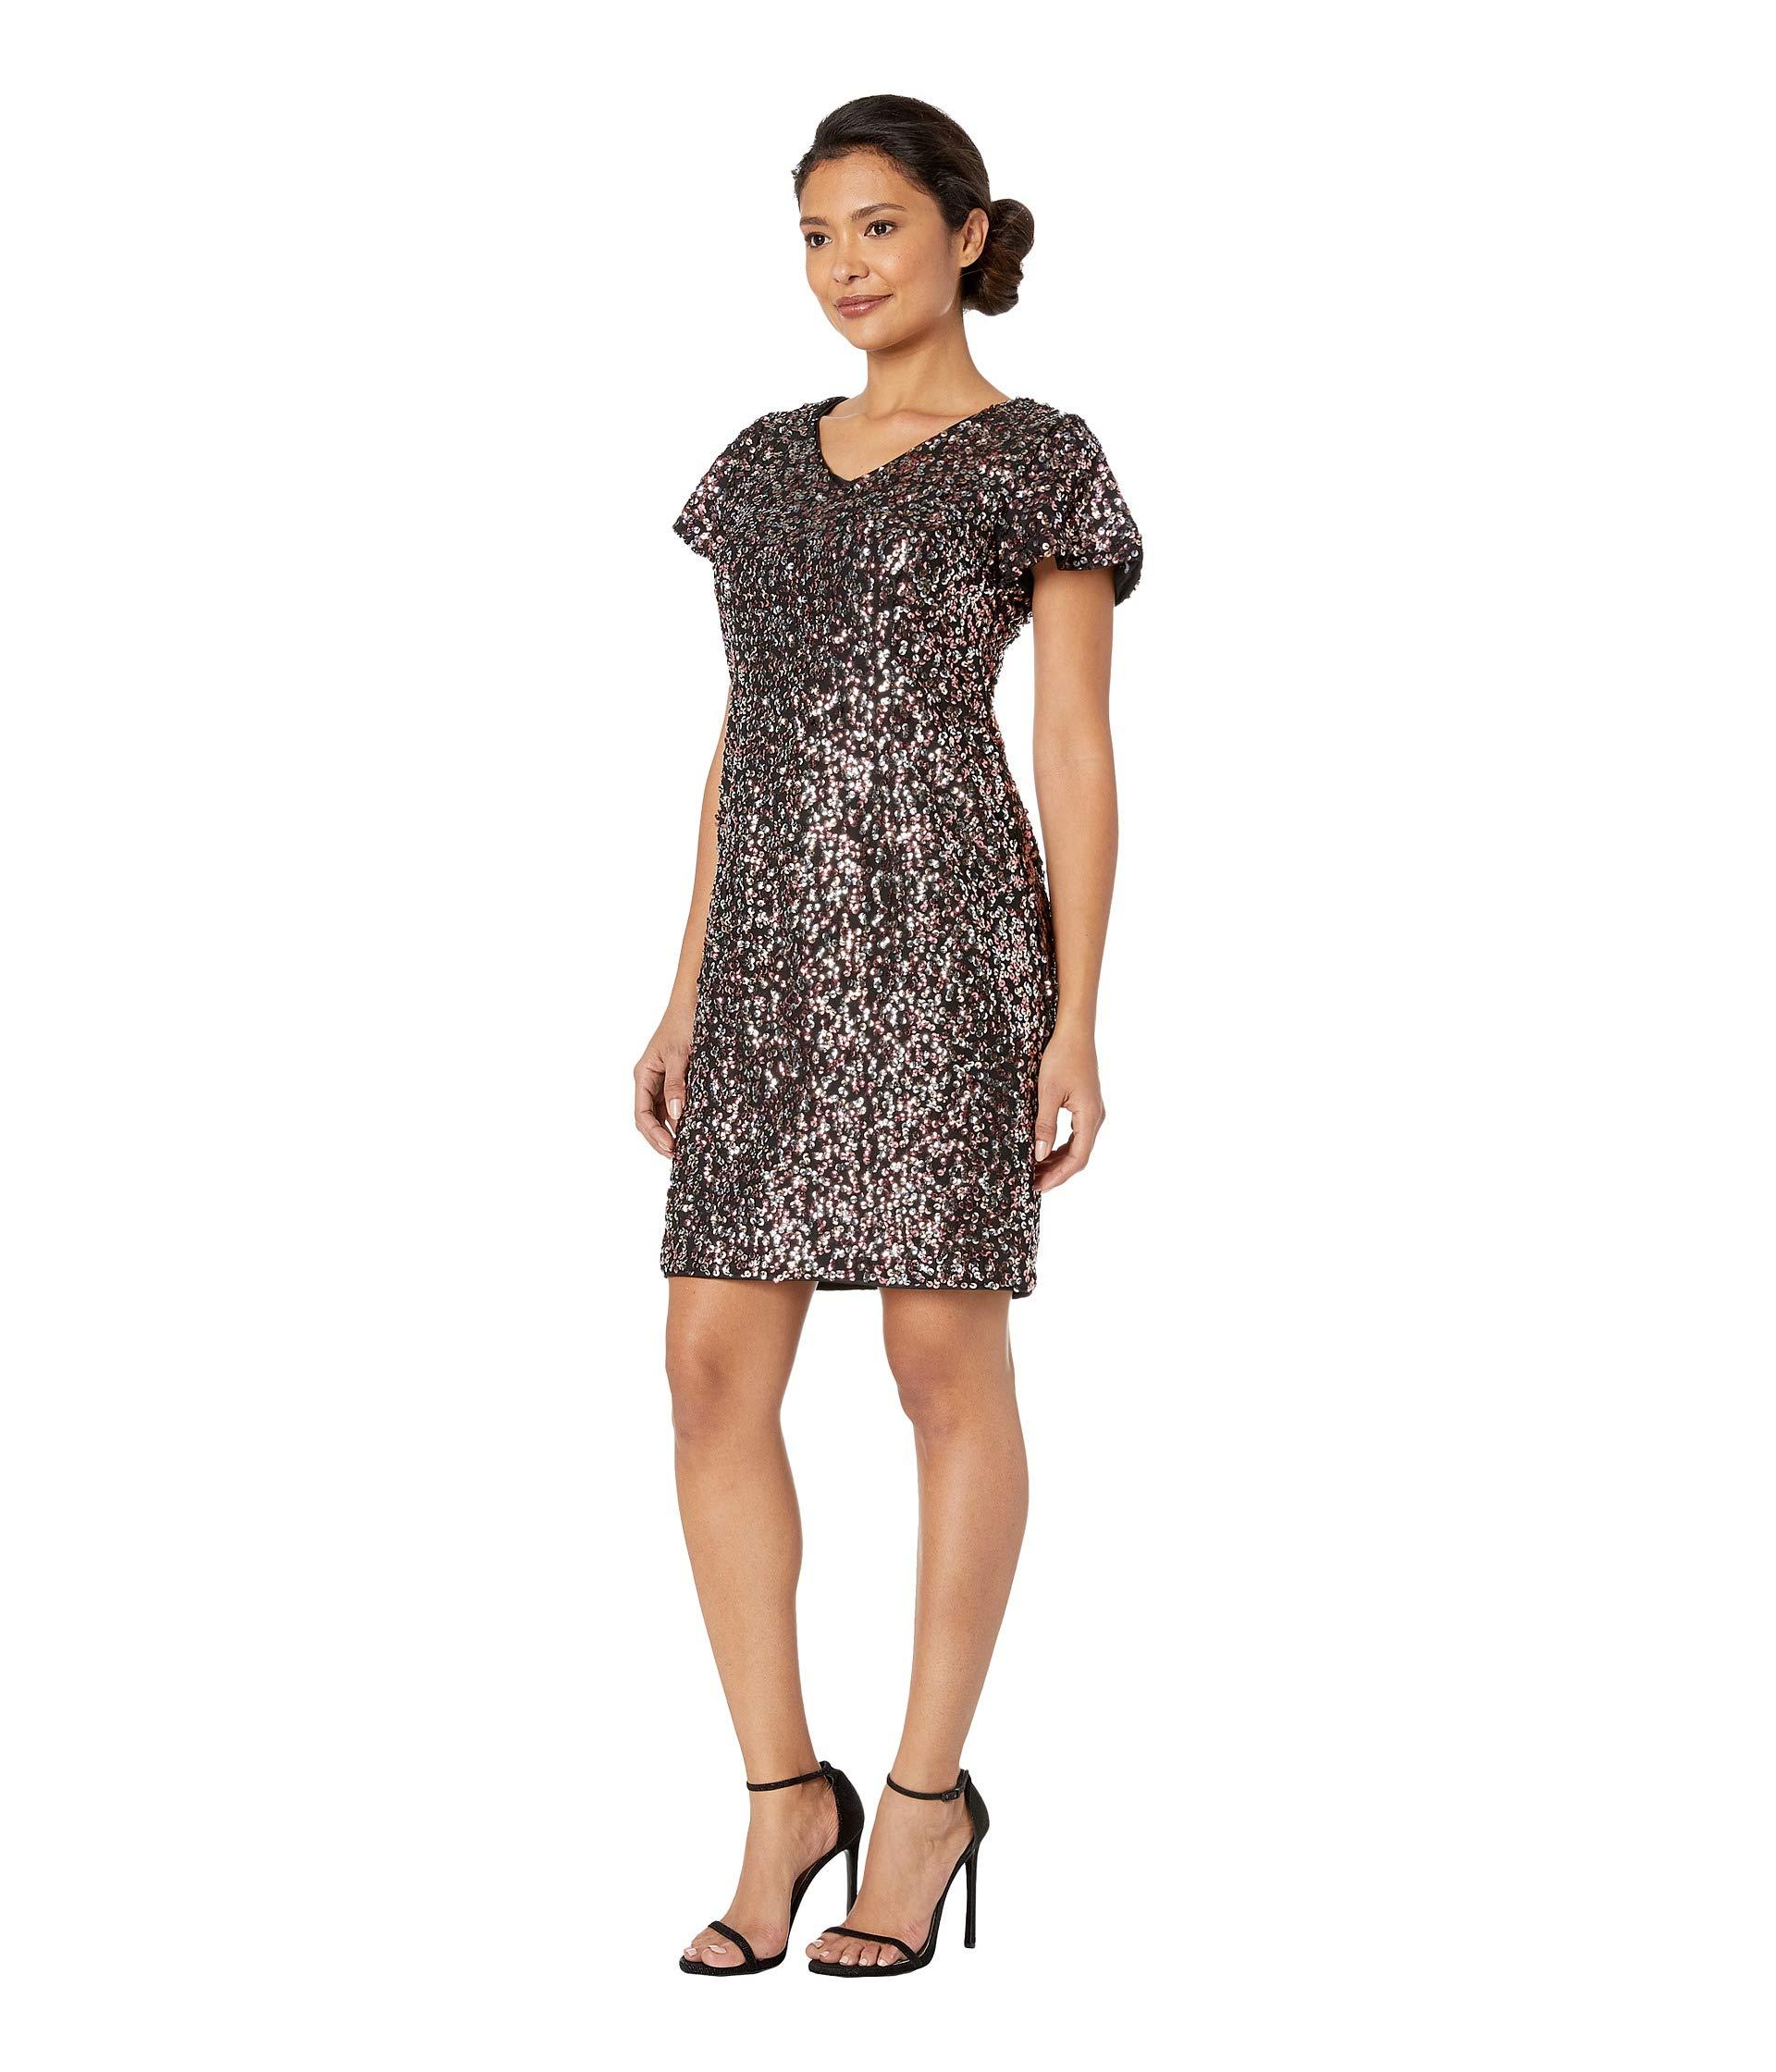 Coral Sweet Fluttered Short V sequin Dress neck Camuto Mesh Vince Sleeve Multi PAHHqx